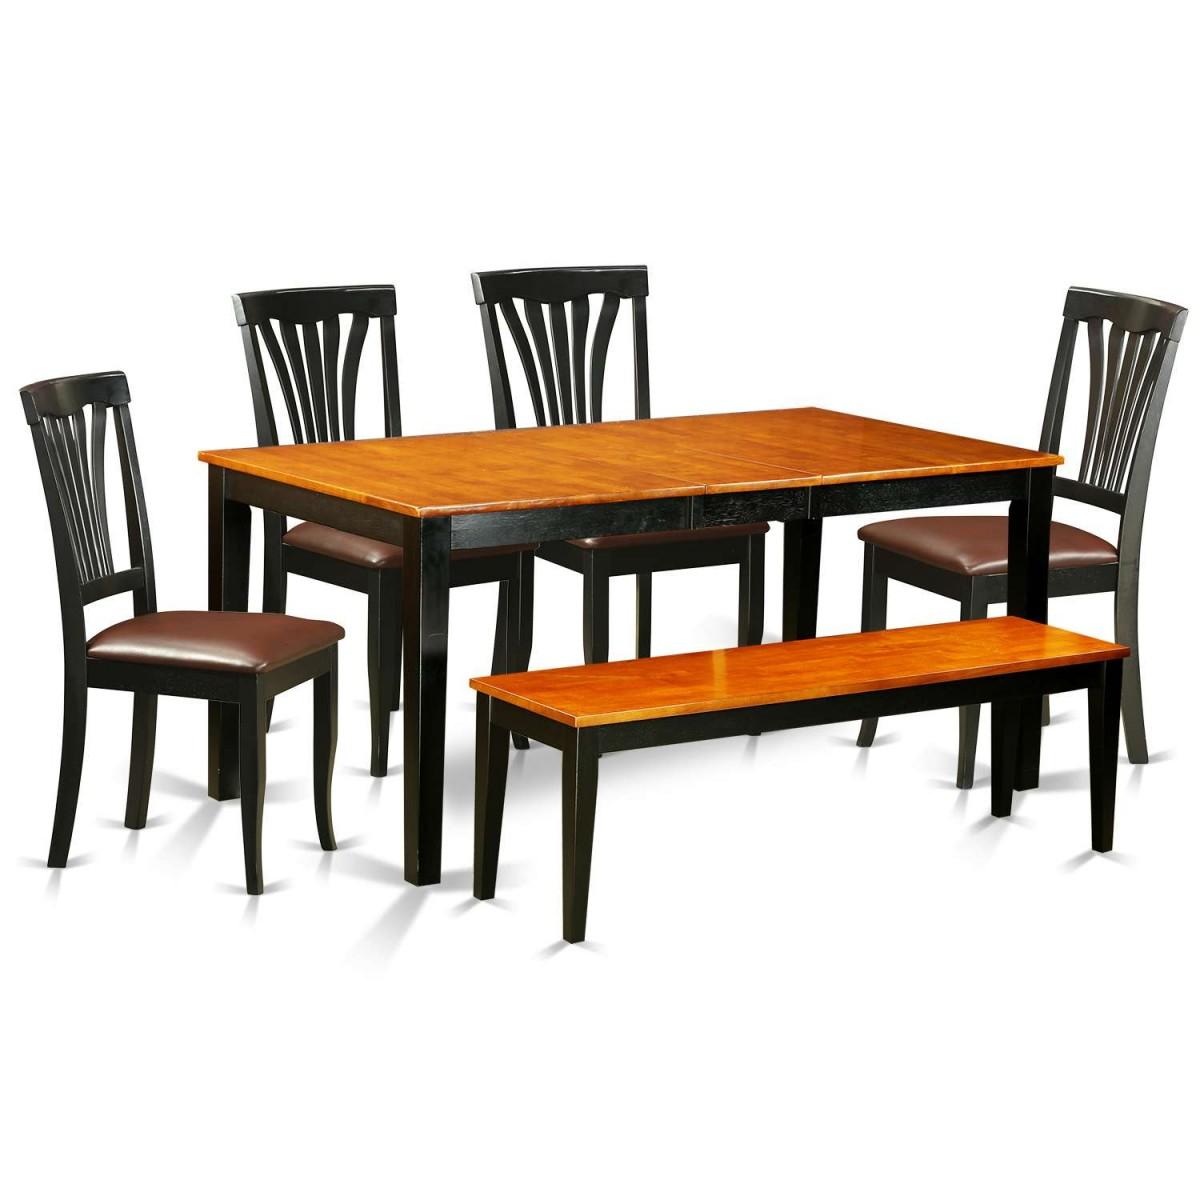 East West Nicoli 6 Piece Dining Set: East West Furniture Nicoli 6 Piece Kitchen Table Set